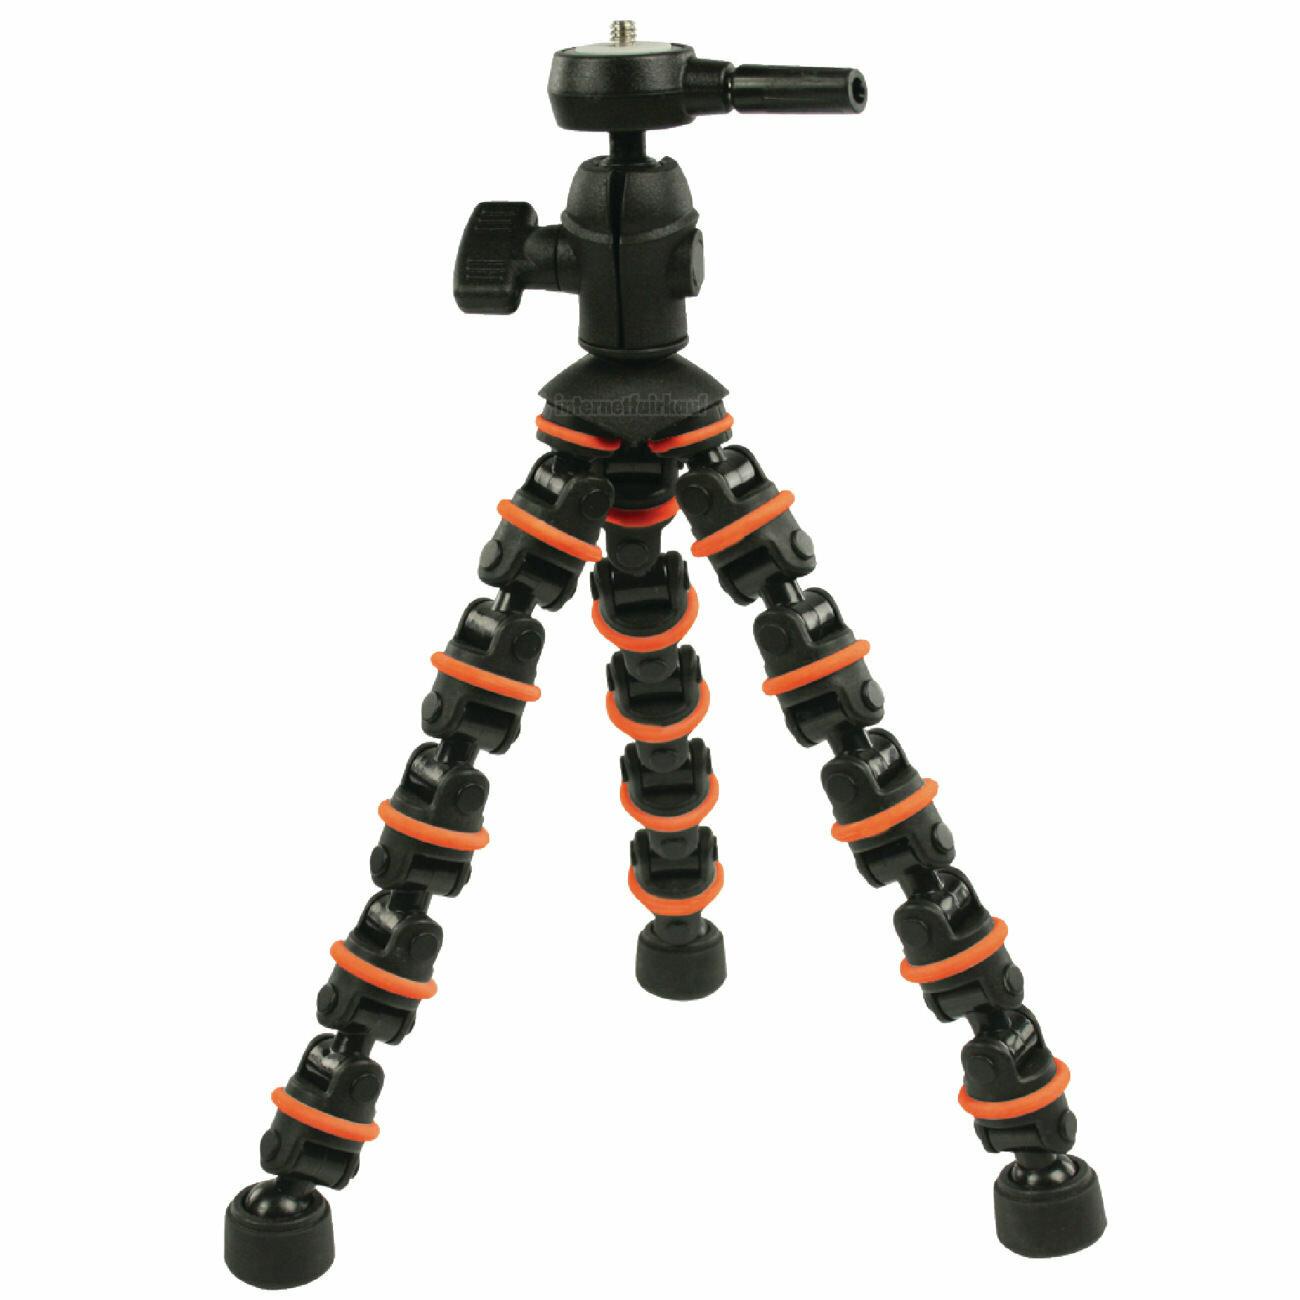 Camlink CL-TP140 flexibles 3-Bein Mini-Stativ